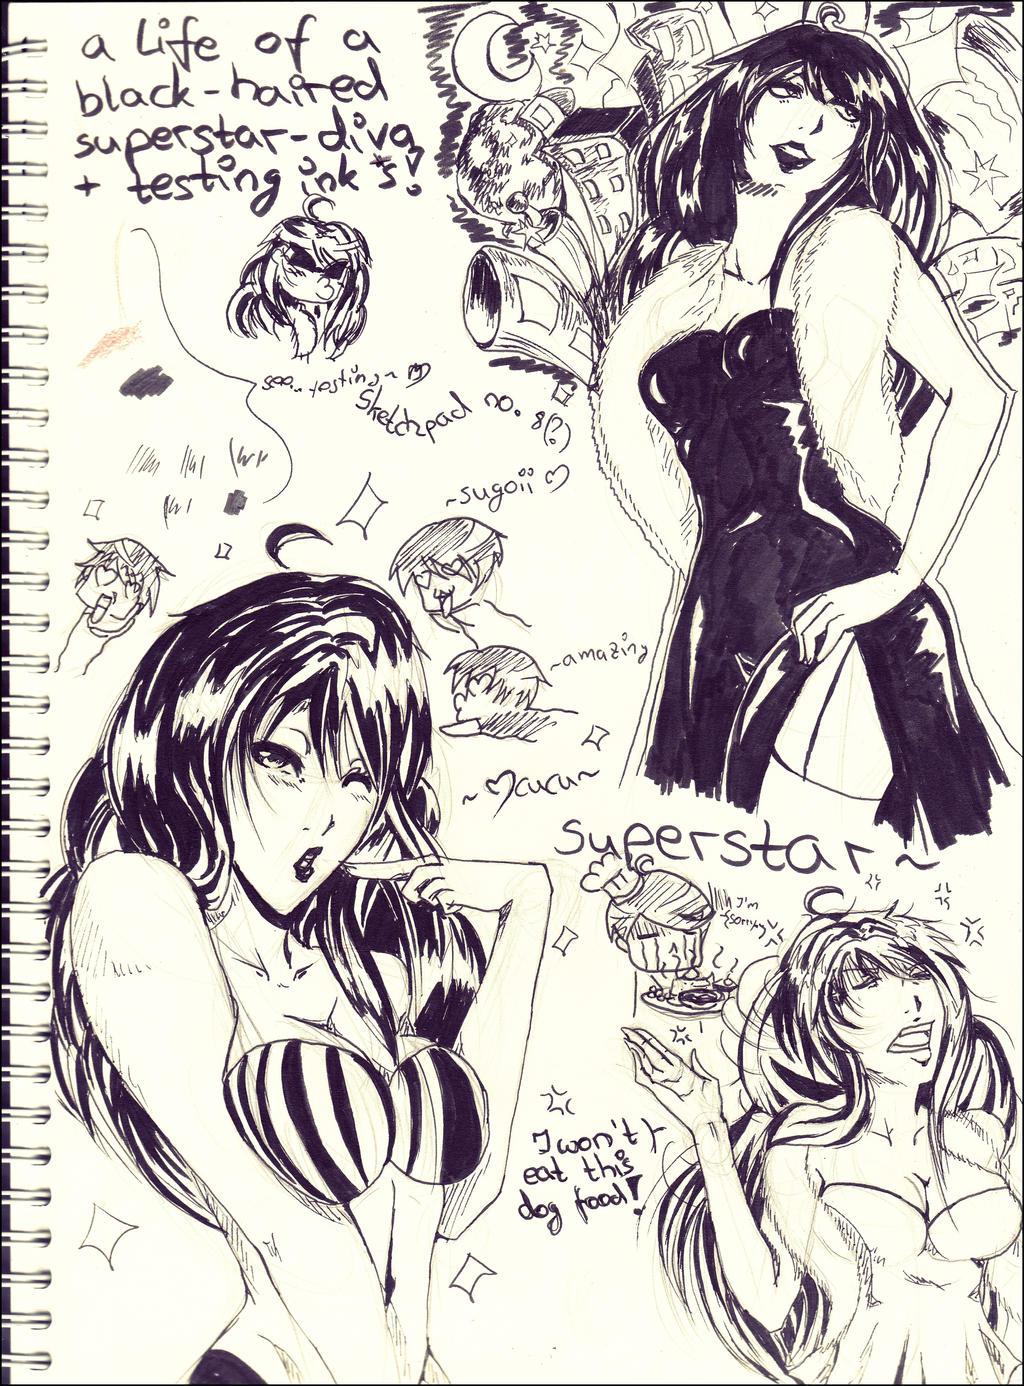 Sketch dump: A Superstar's Life by IStealYourCookiesx3